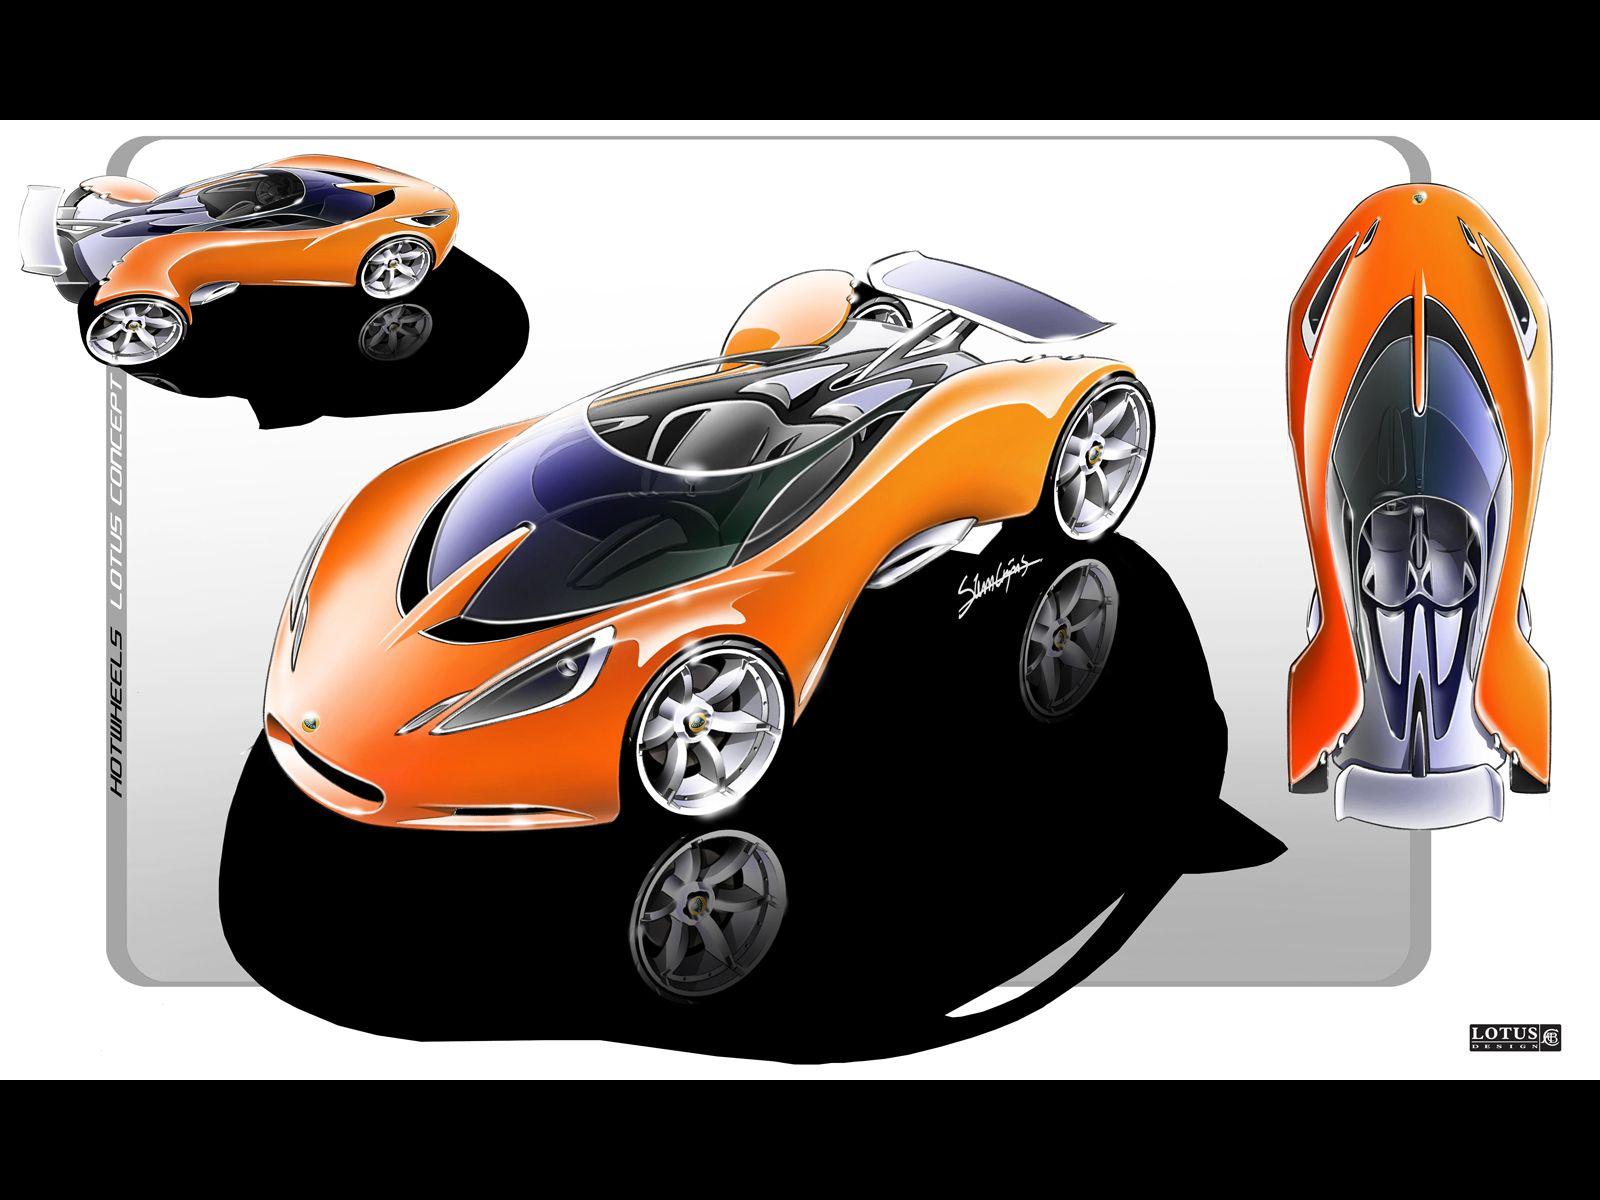 Hot Wheels Exotics Cars 1600x1200 Wallpaper Teahub Io